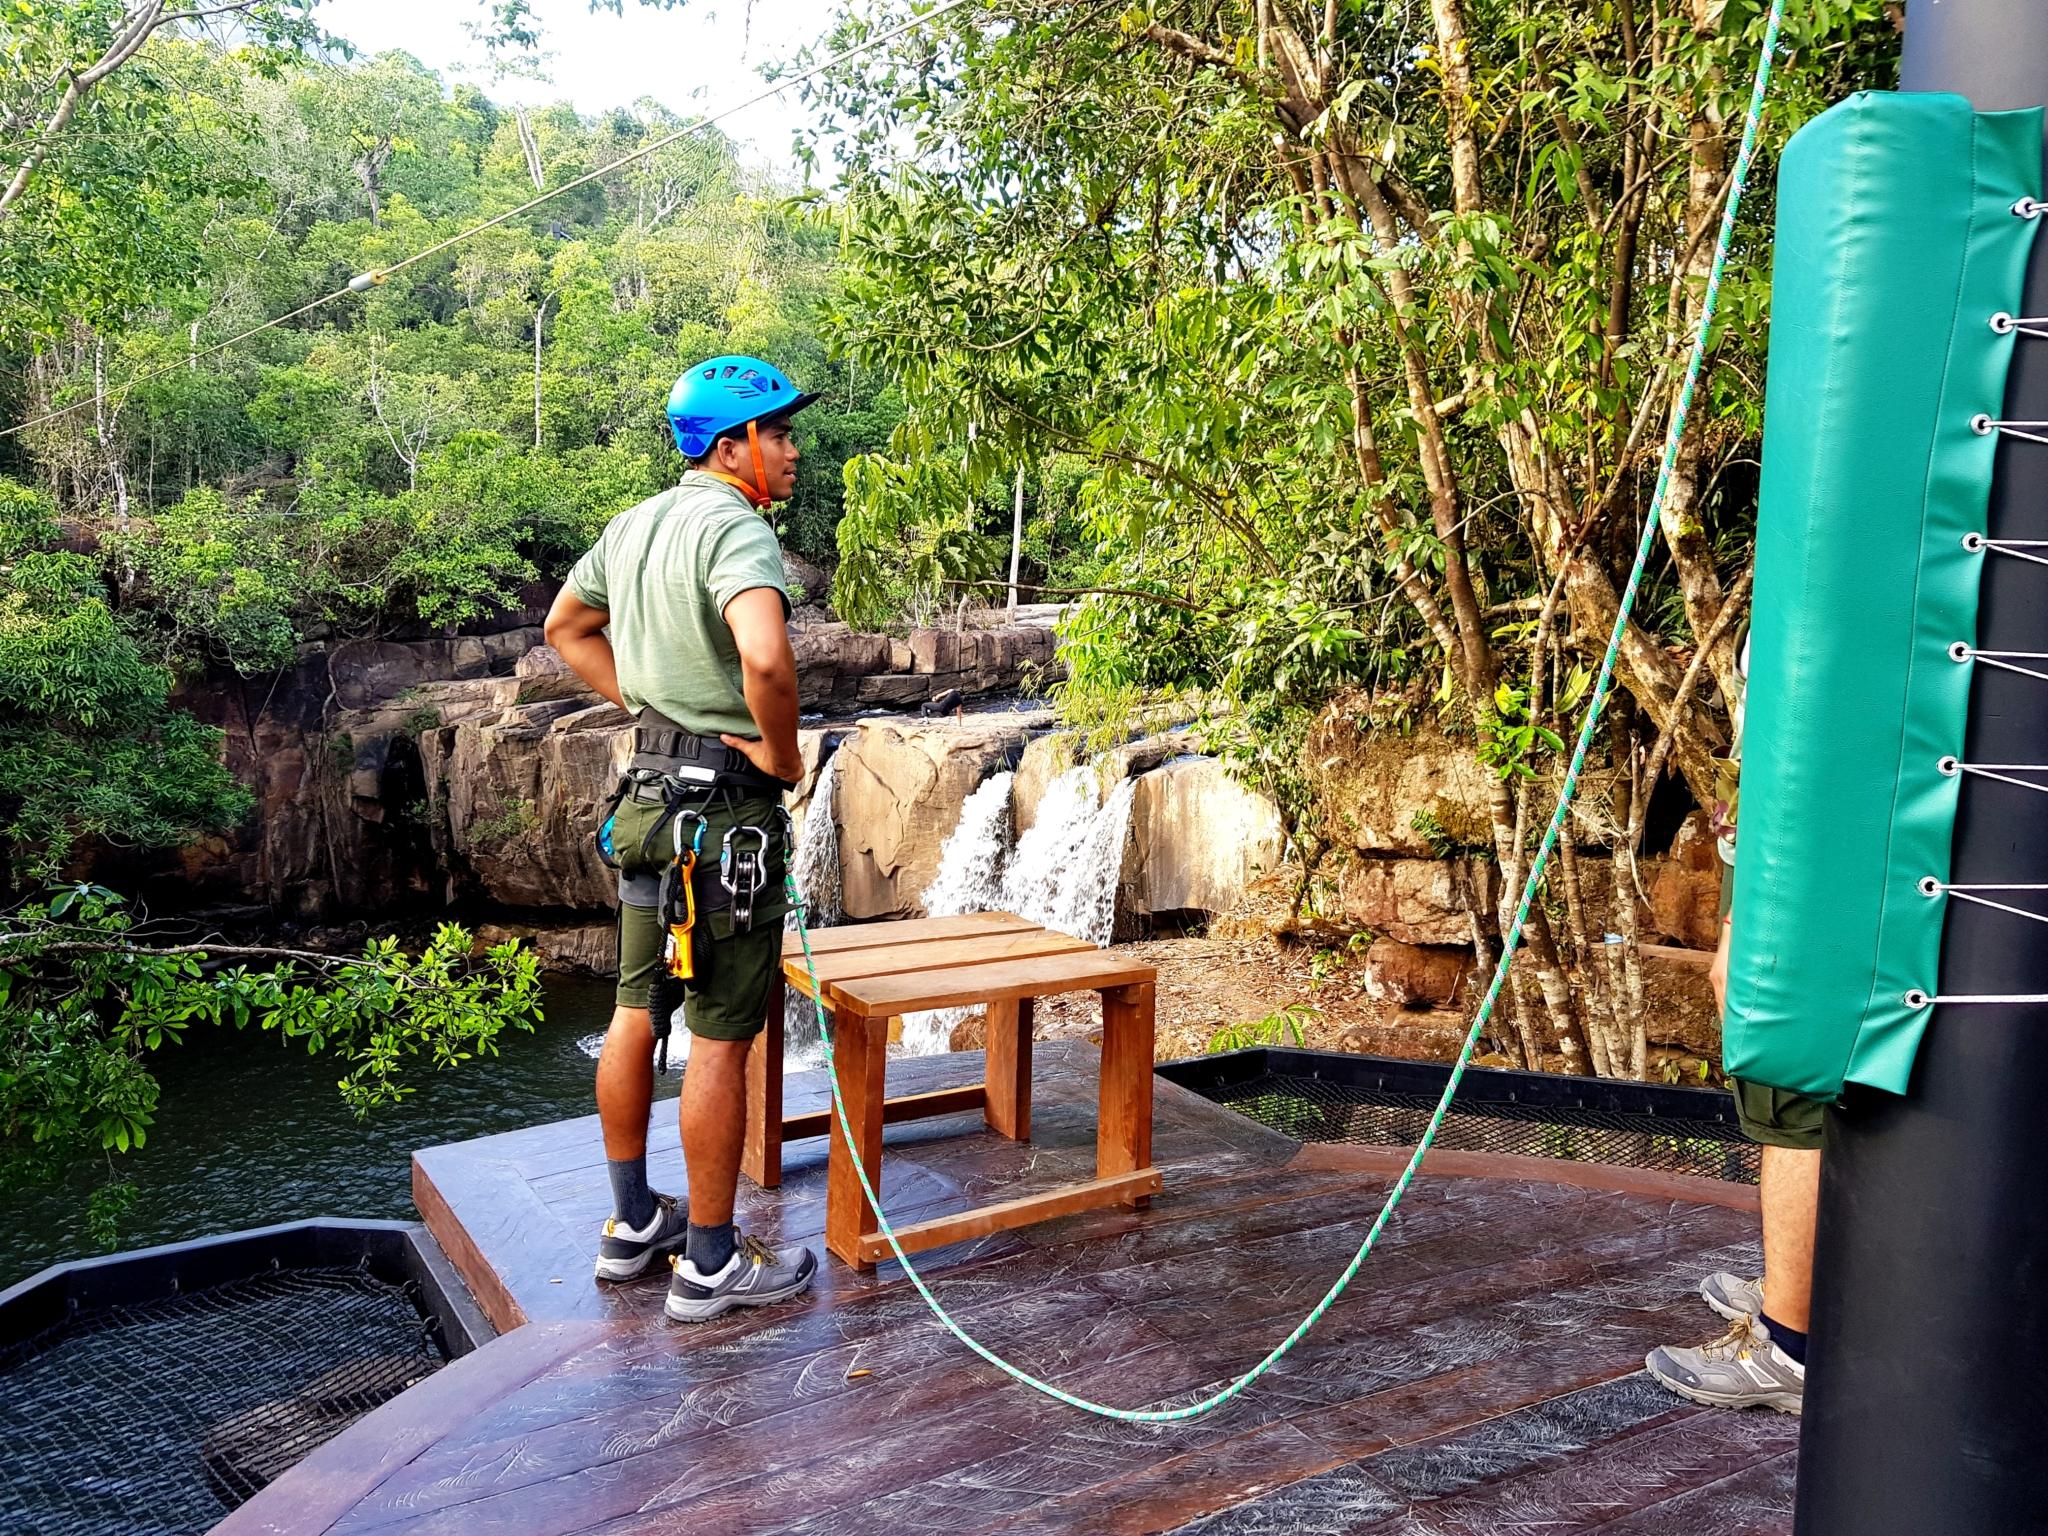 wildlife alliance Wildlife Alliance Founder and CEO, Suwanna Gauntlett visit at Shinta Mani Wild Suwanna Gauntlett visit at Shinta Mani Wild